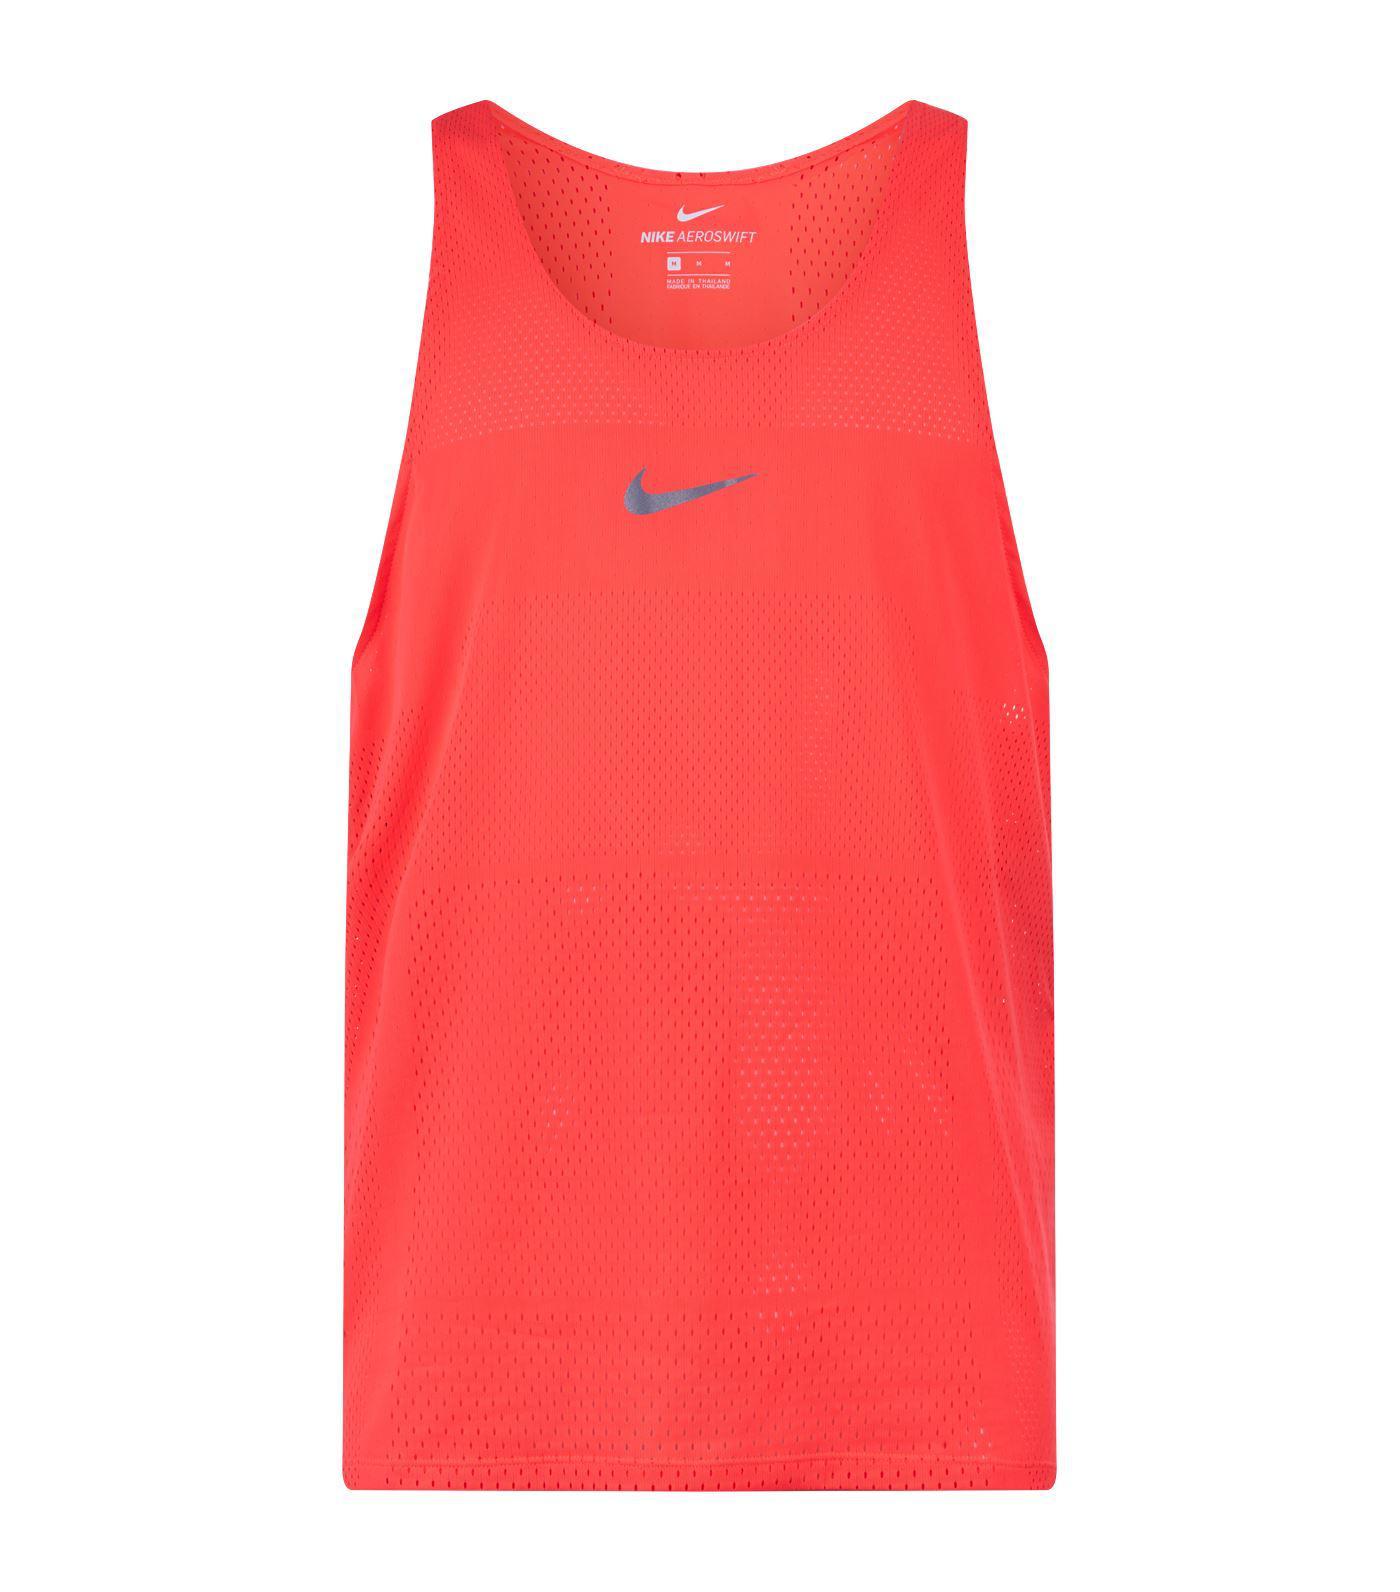 bab7ff6038c8cf Lyst - Nike Aeroswift Running Tank Top in Red for Men